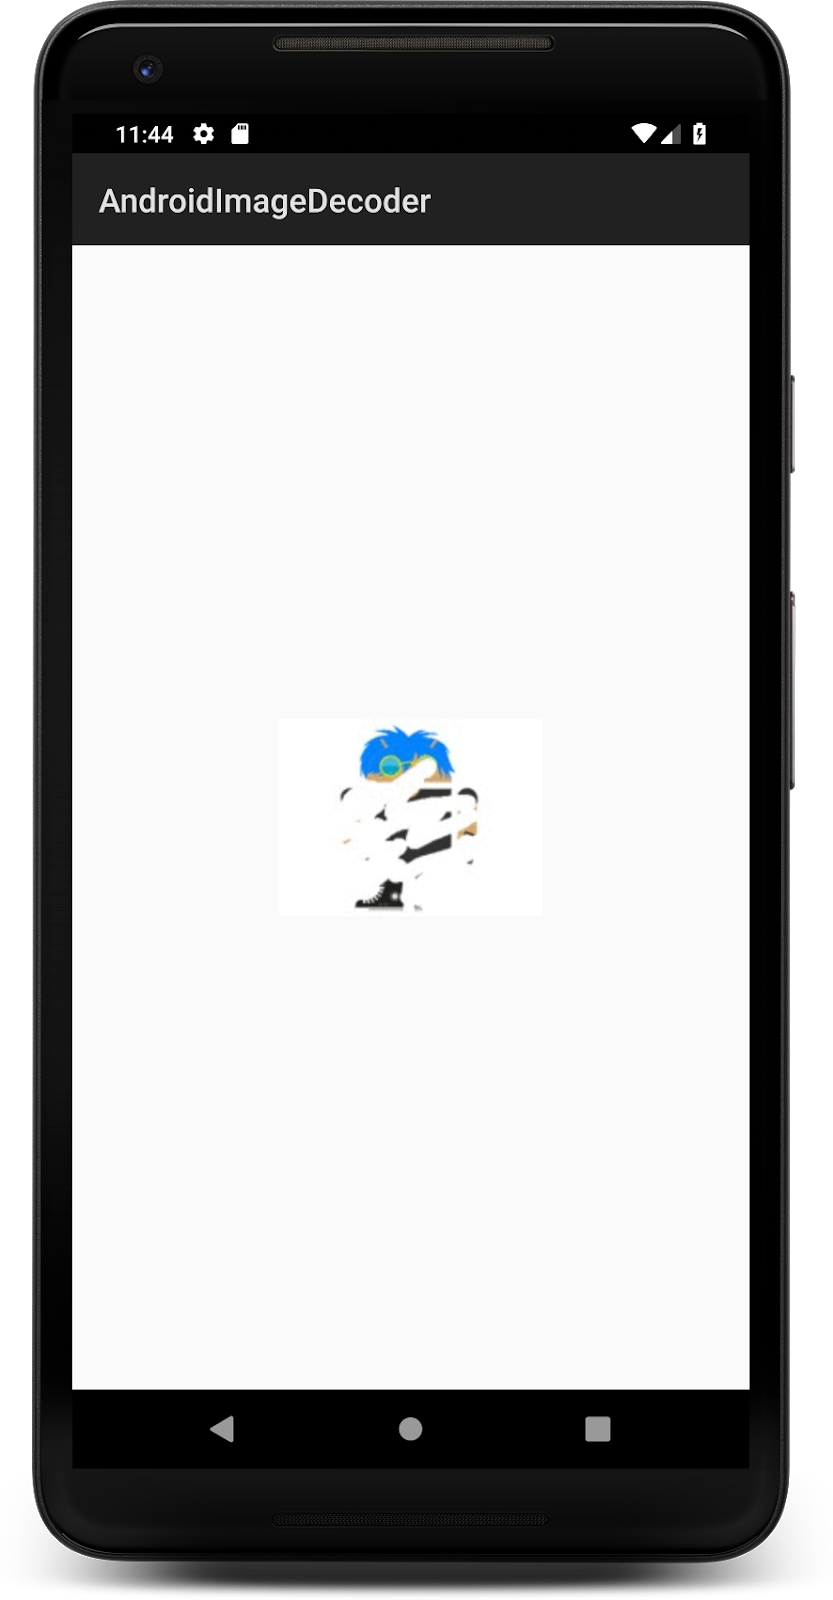 Display Animated Gif Using Imagedecoder – RootAndroid org